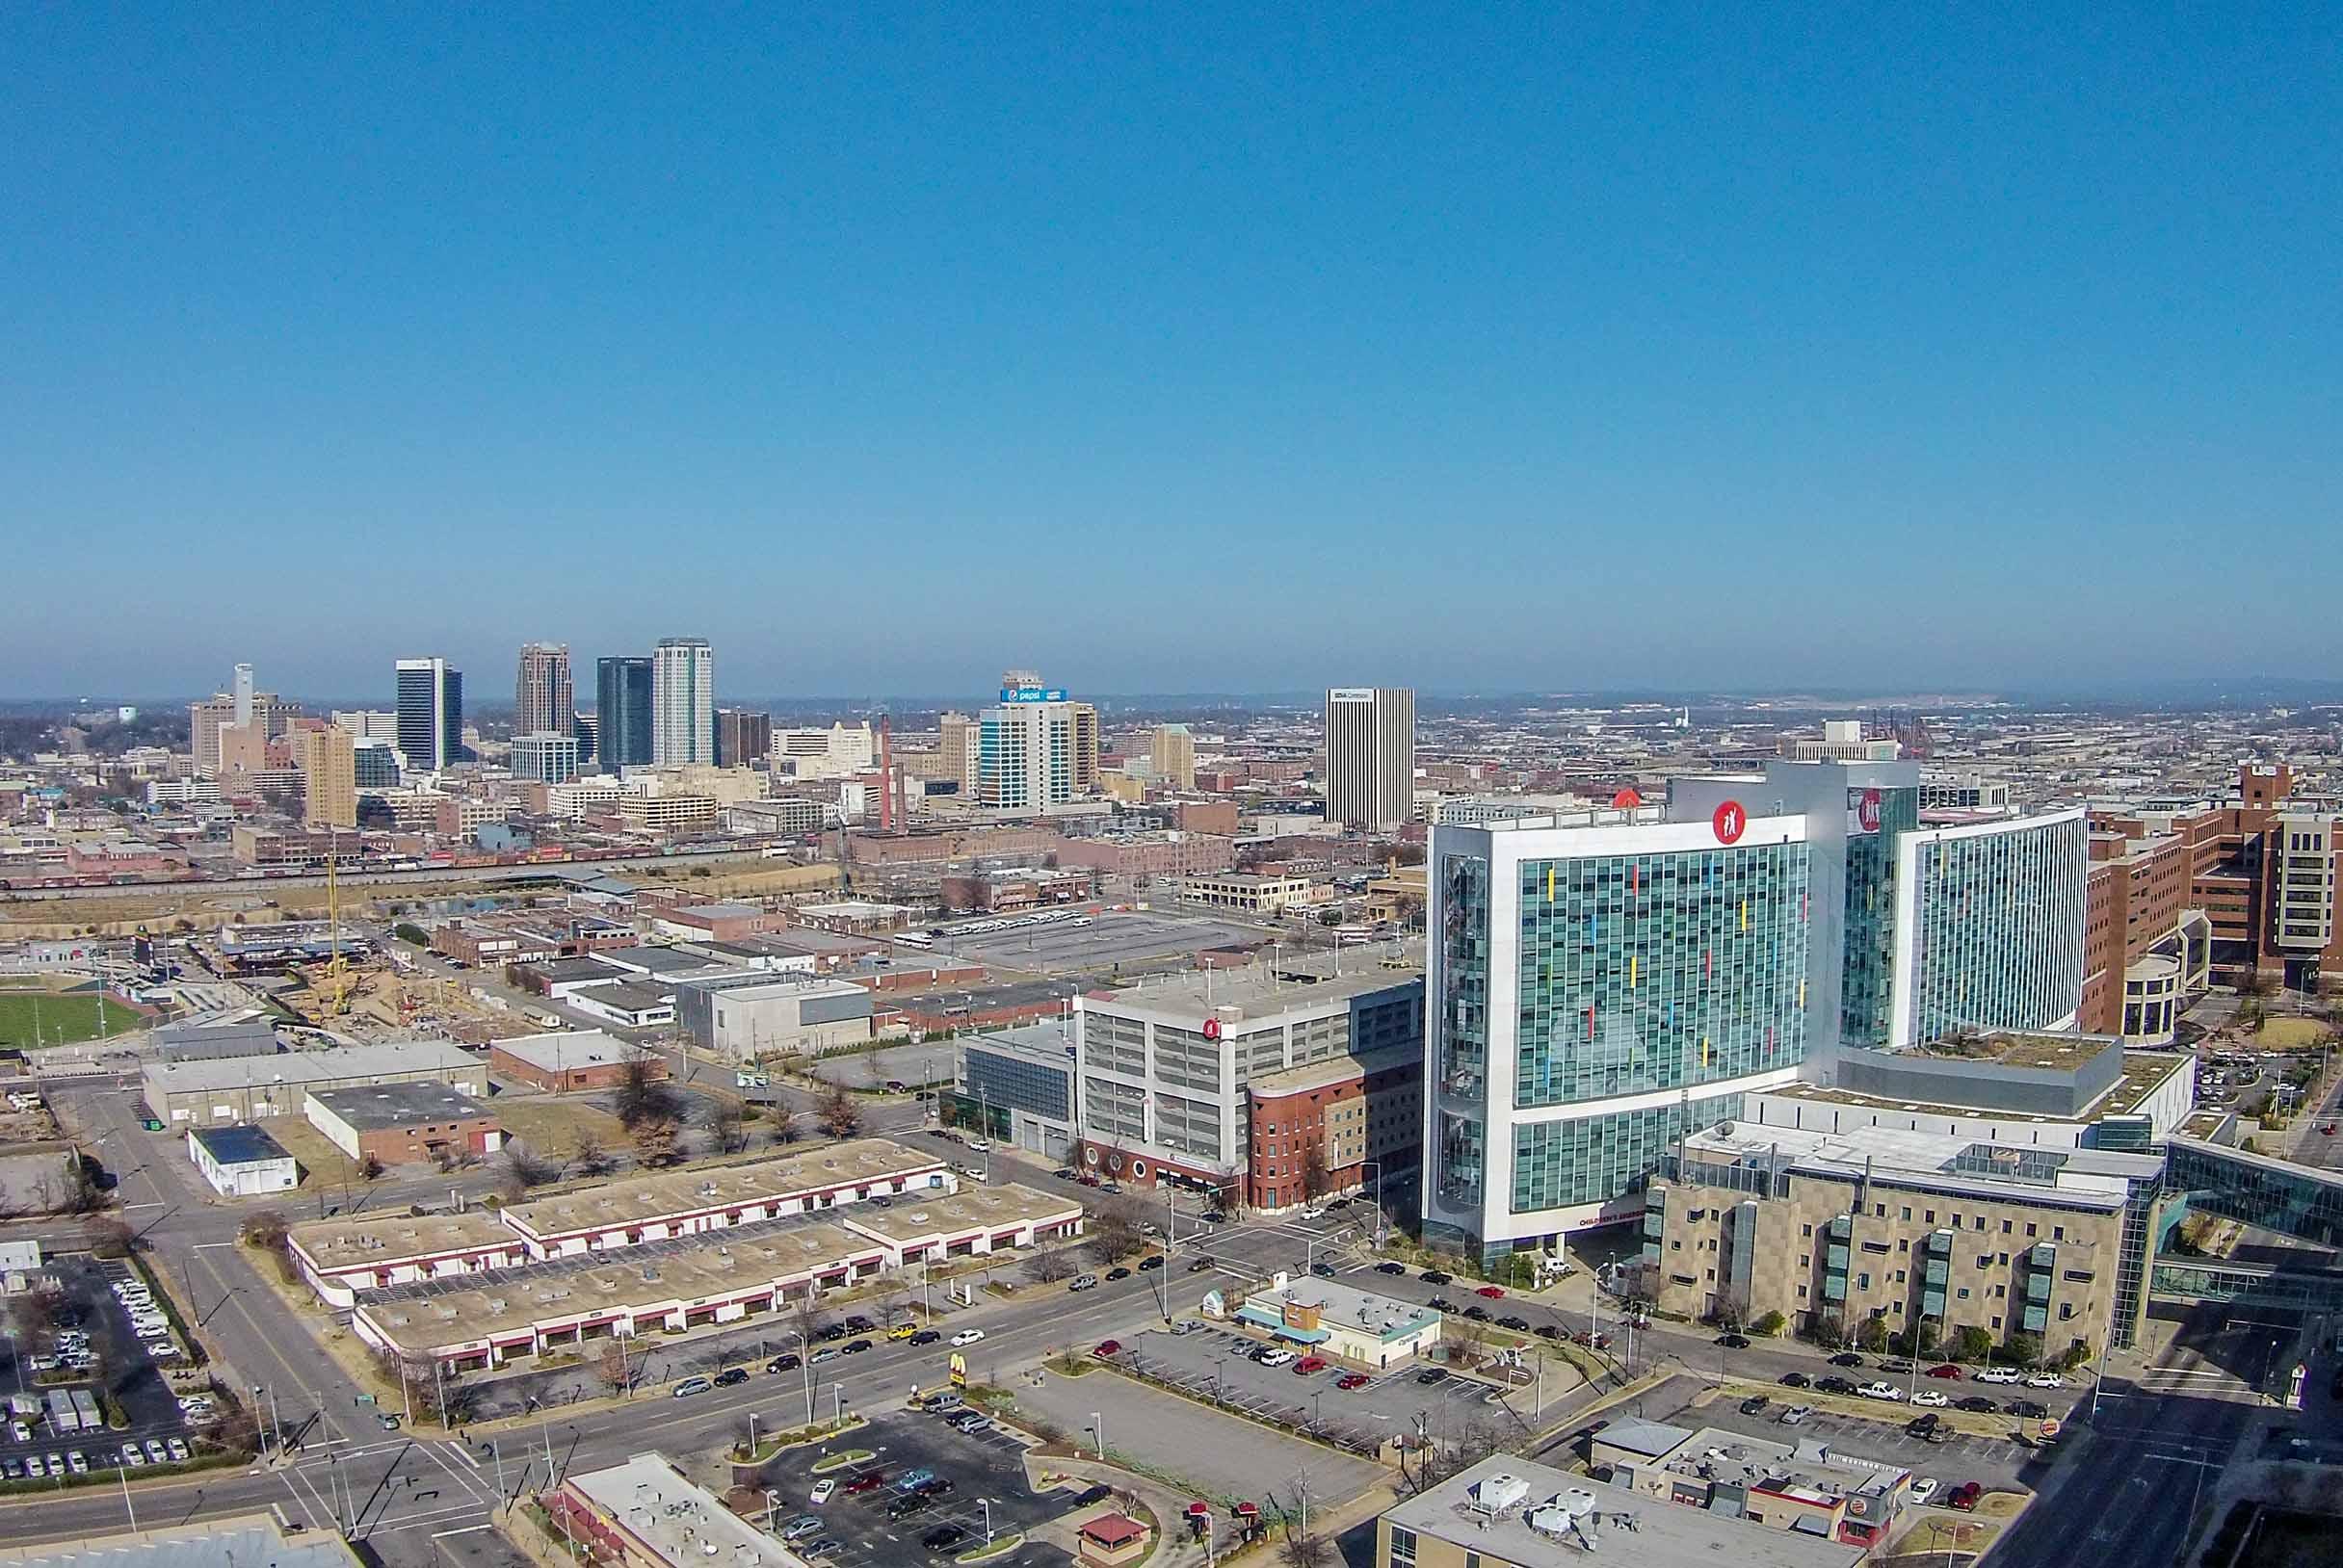 Children's Hospital in Birmingham Alabama Aerial Photography